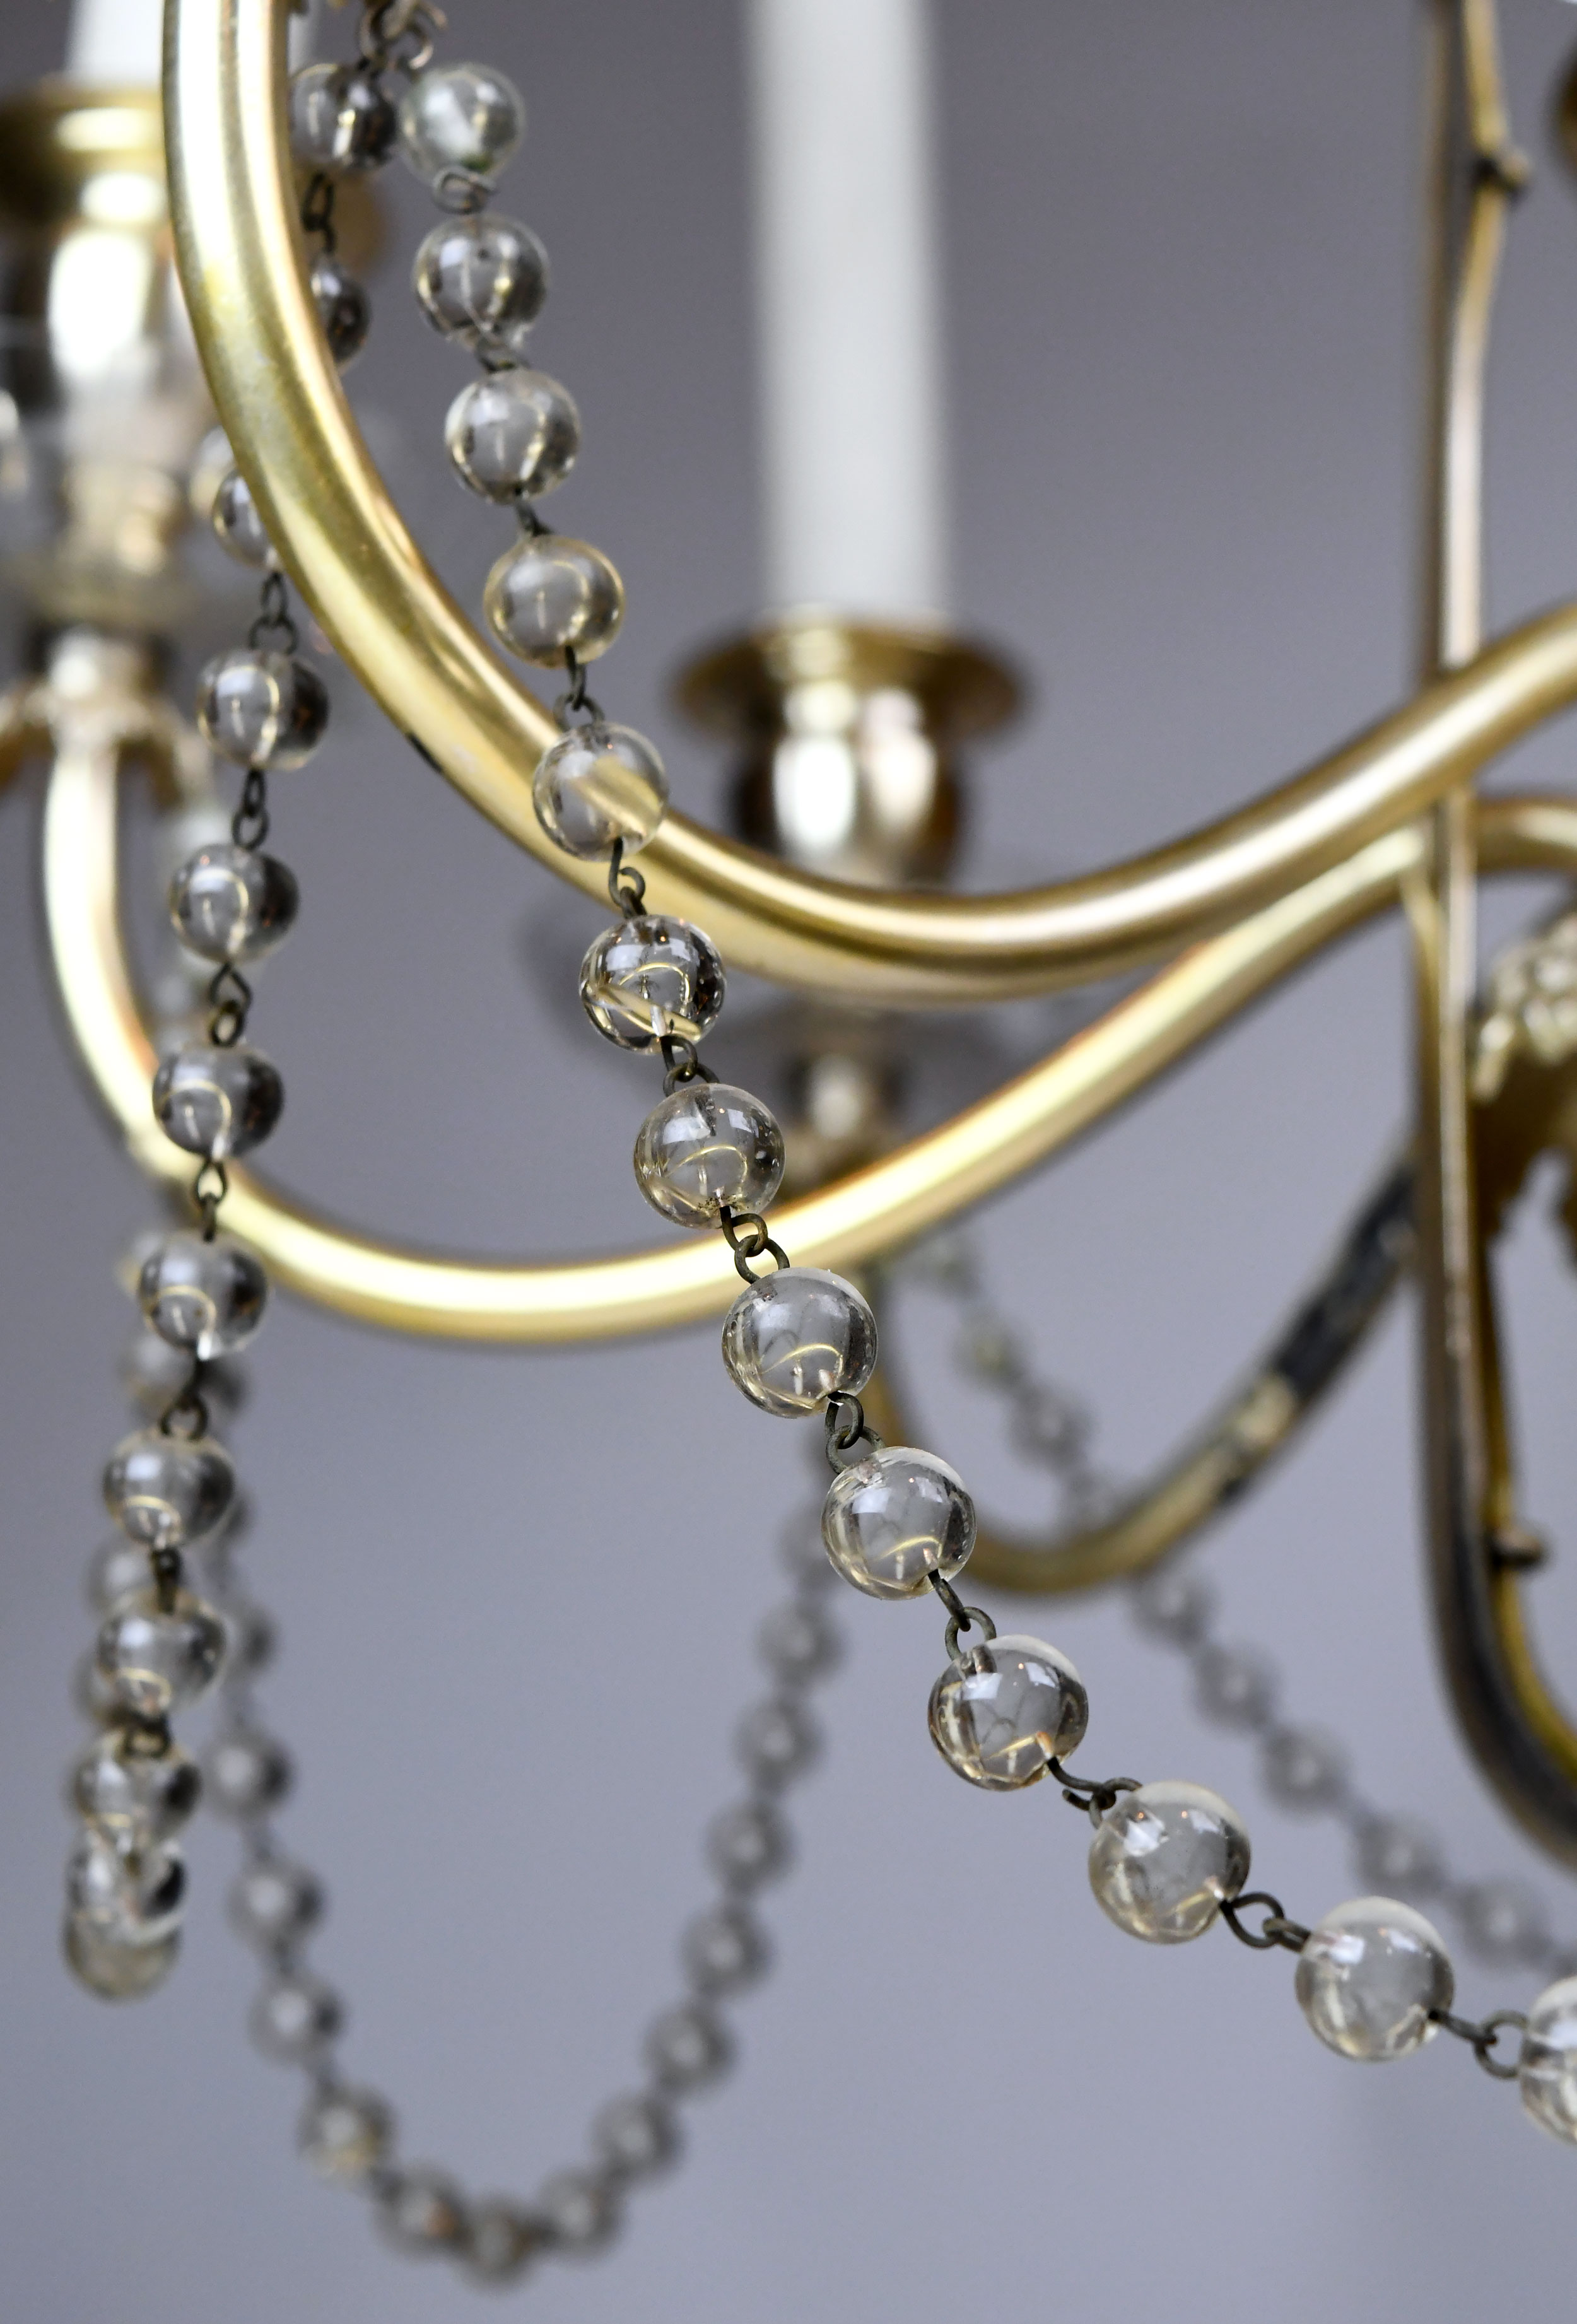 47326-bradley-hubbard-six-arm-chandelier-beading.jpg